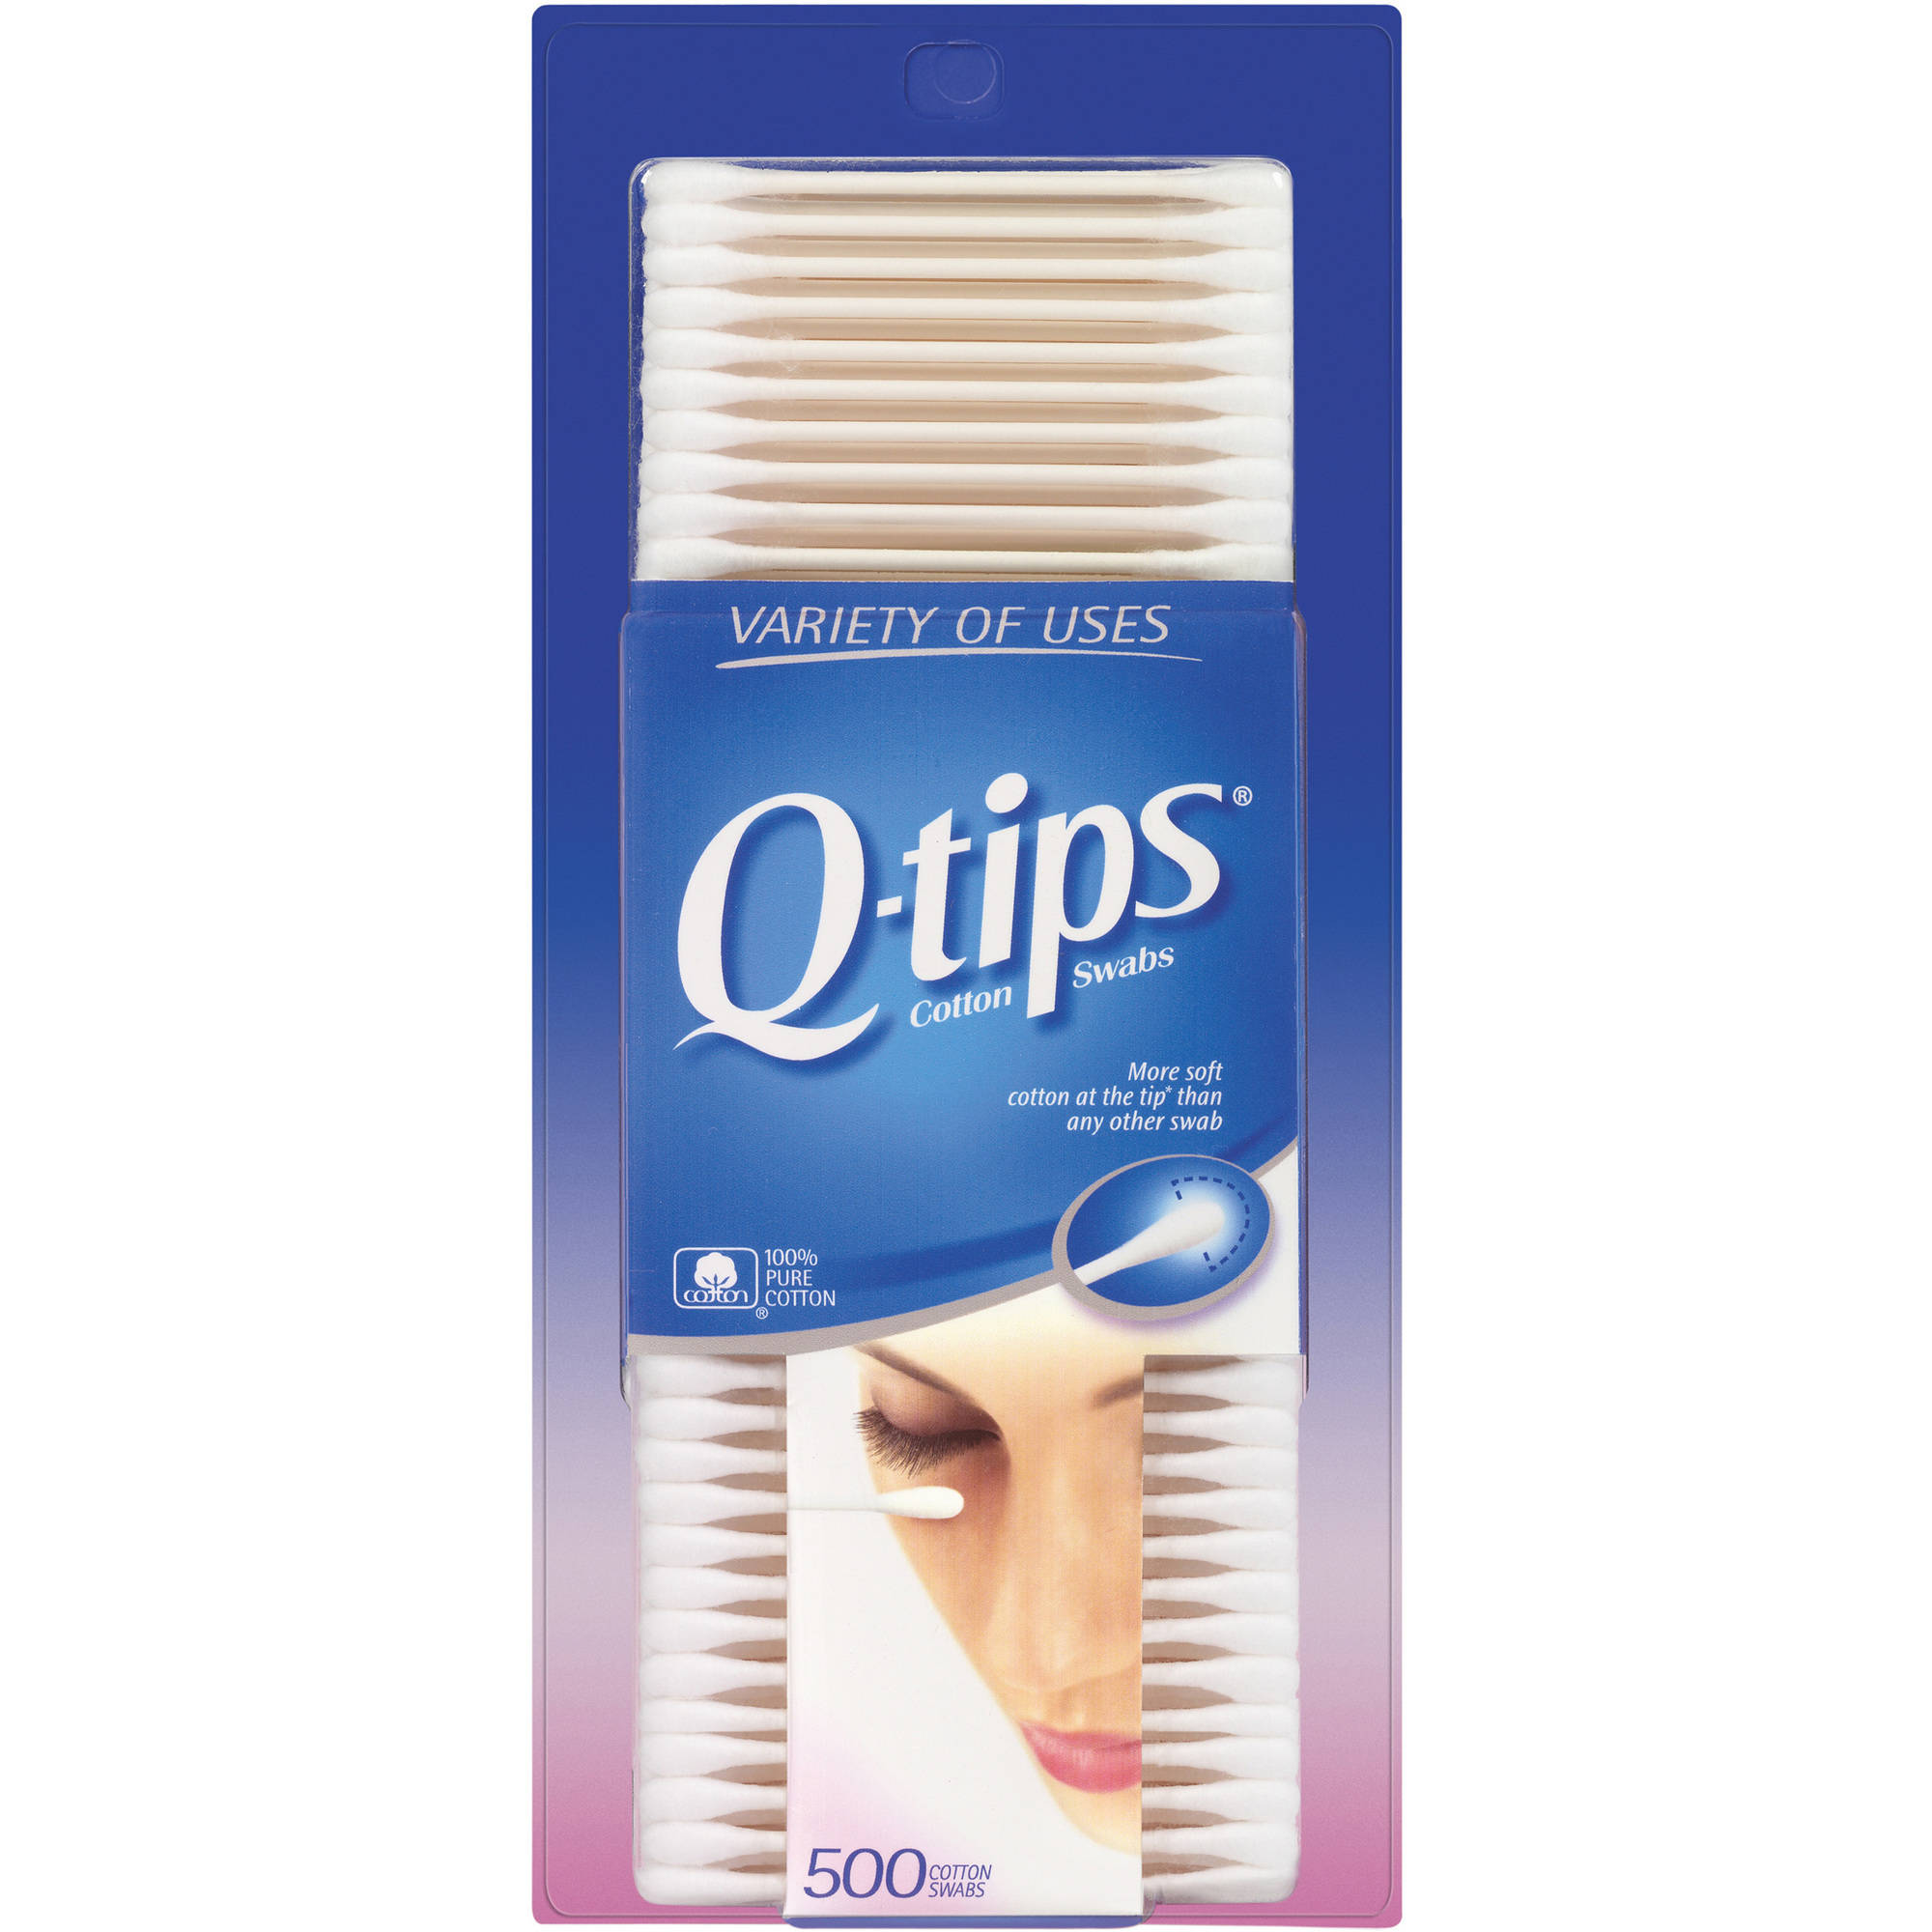 Q-tips Cotton Swabs, 500 count